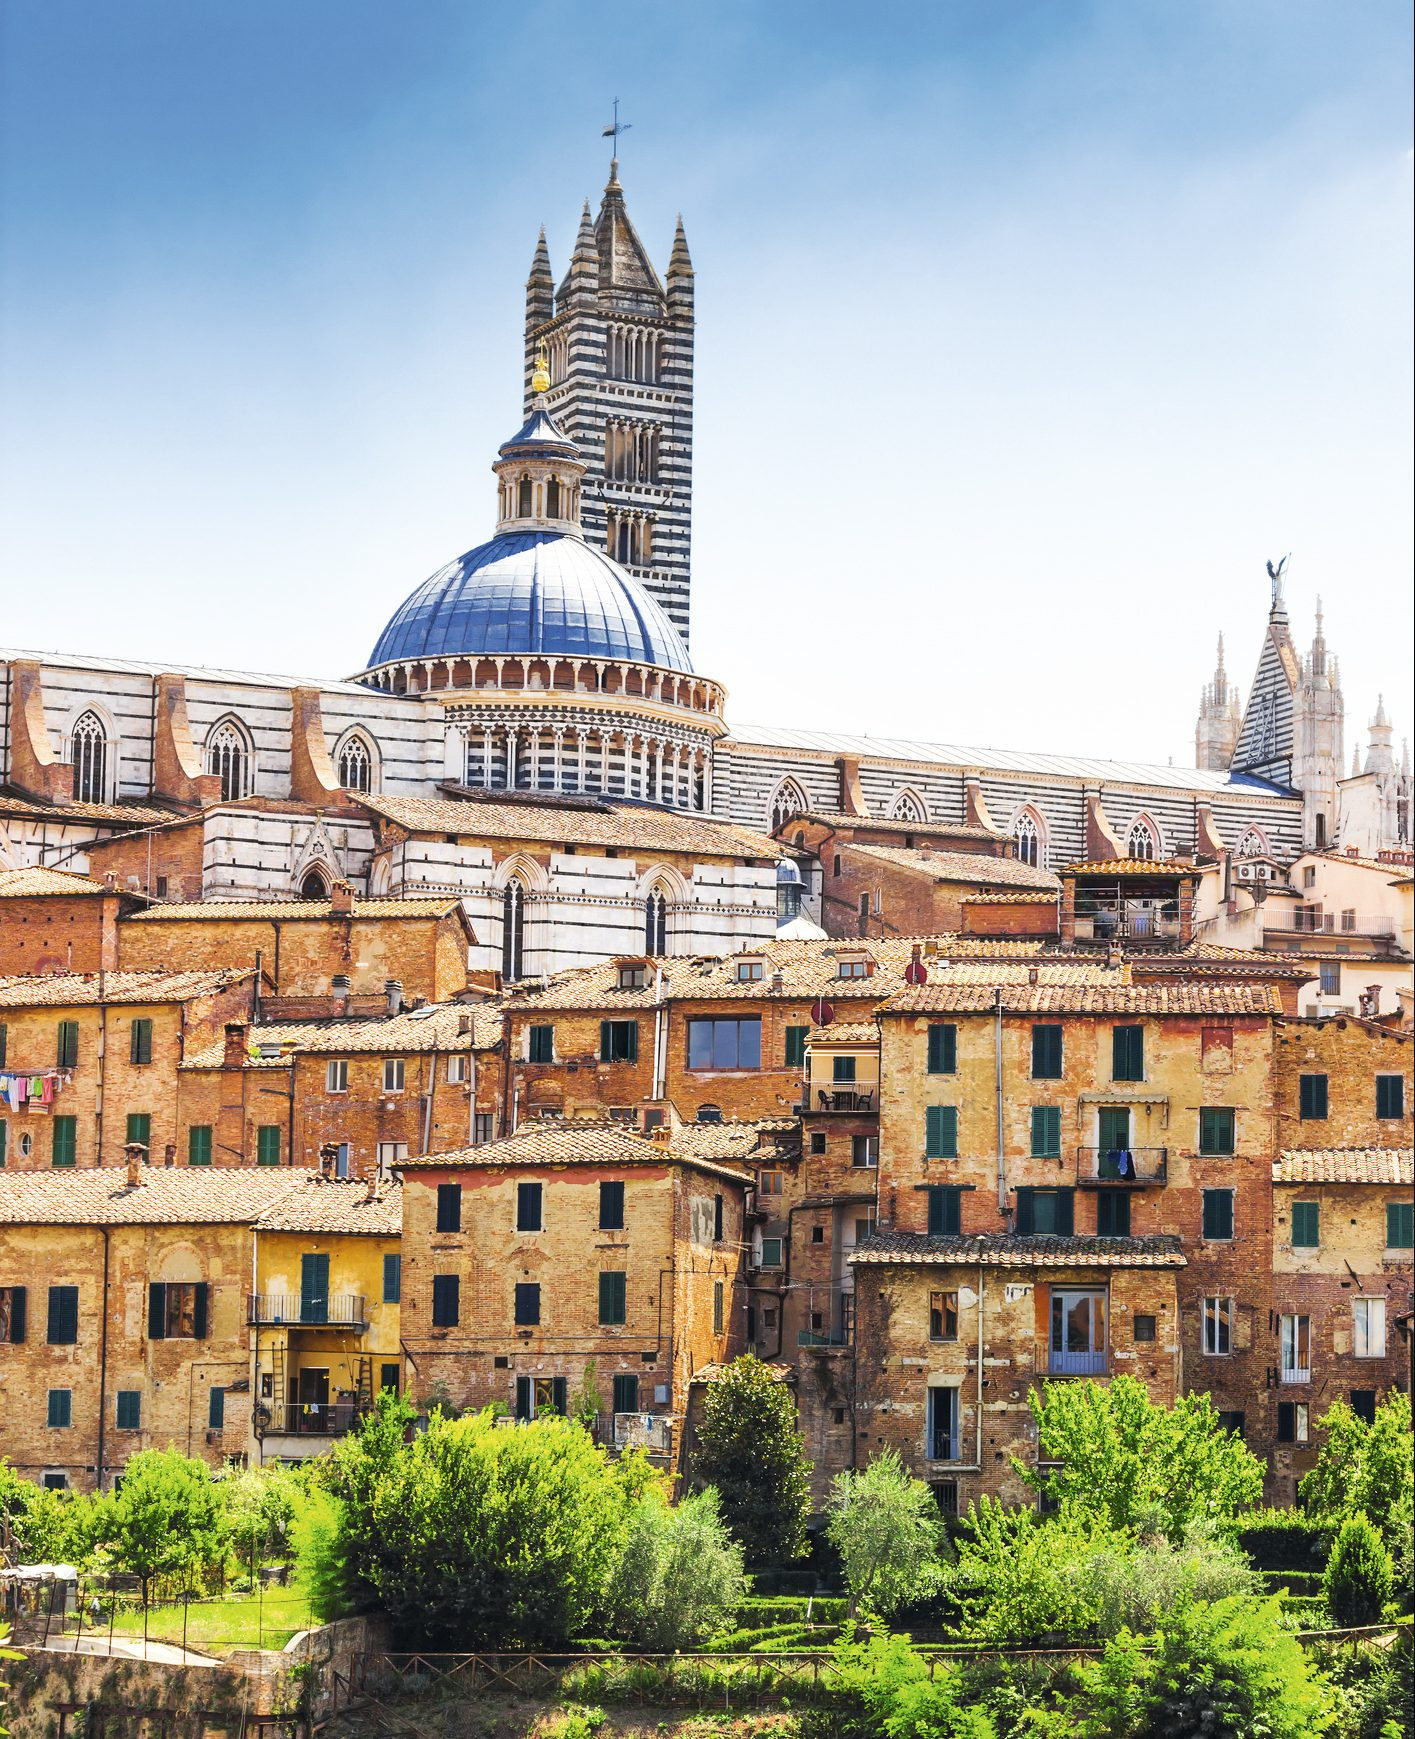 O Duomo de Siena